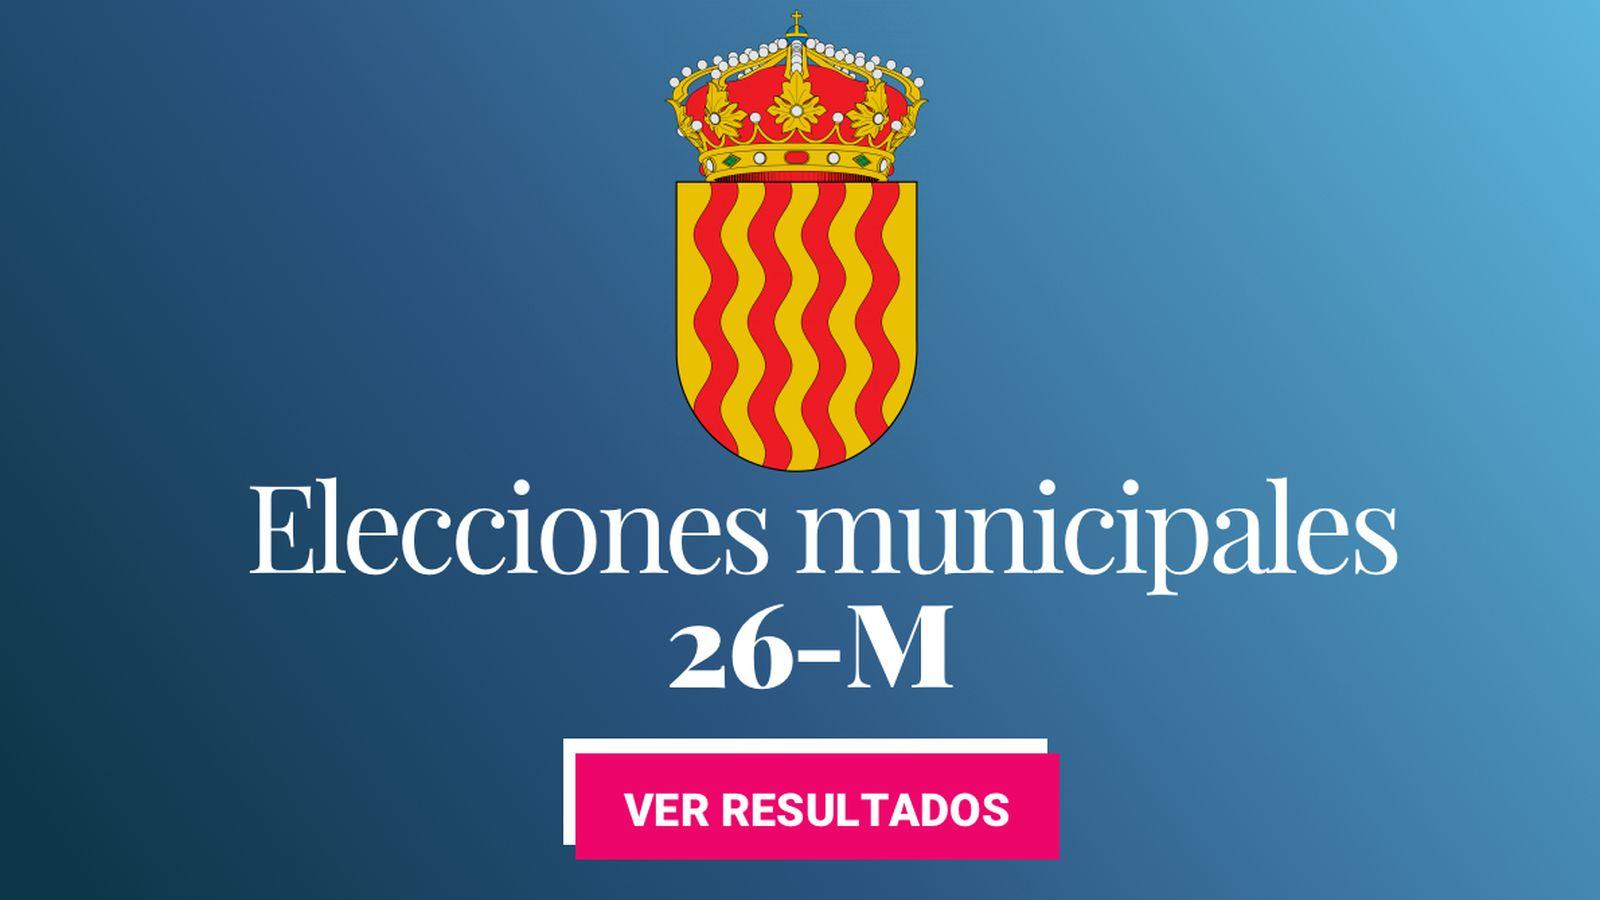 Foto: Elecciones municipales 2019 en Tarragona. (C.C./EC)